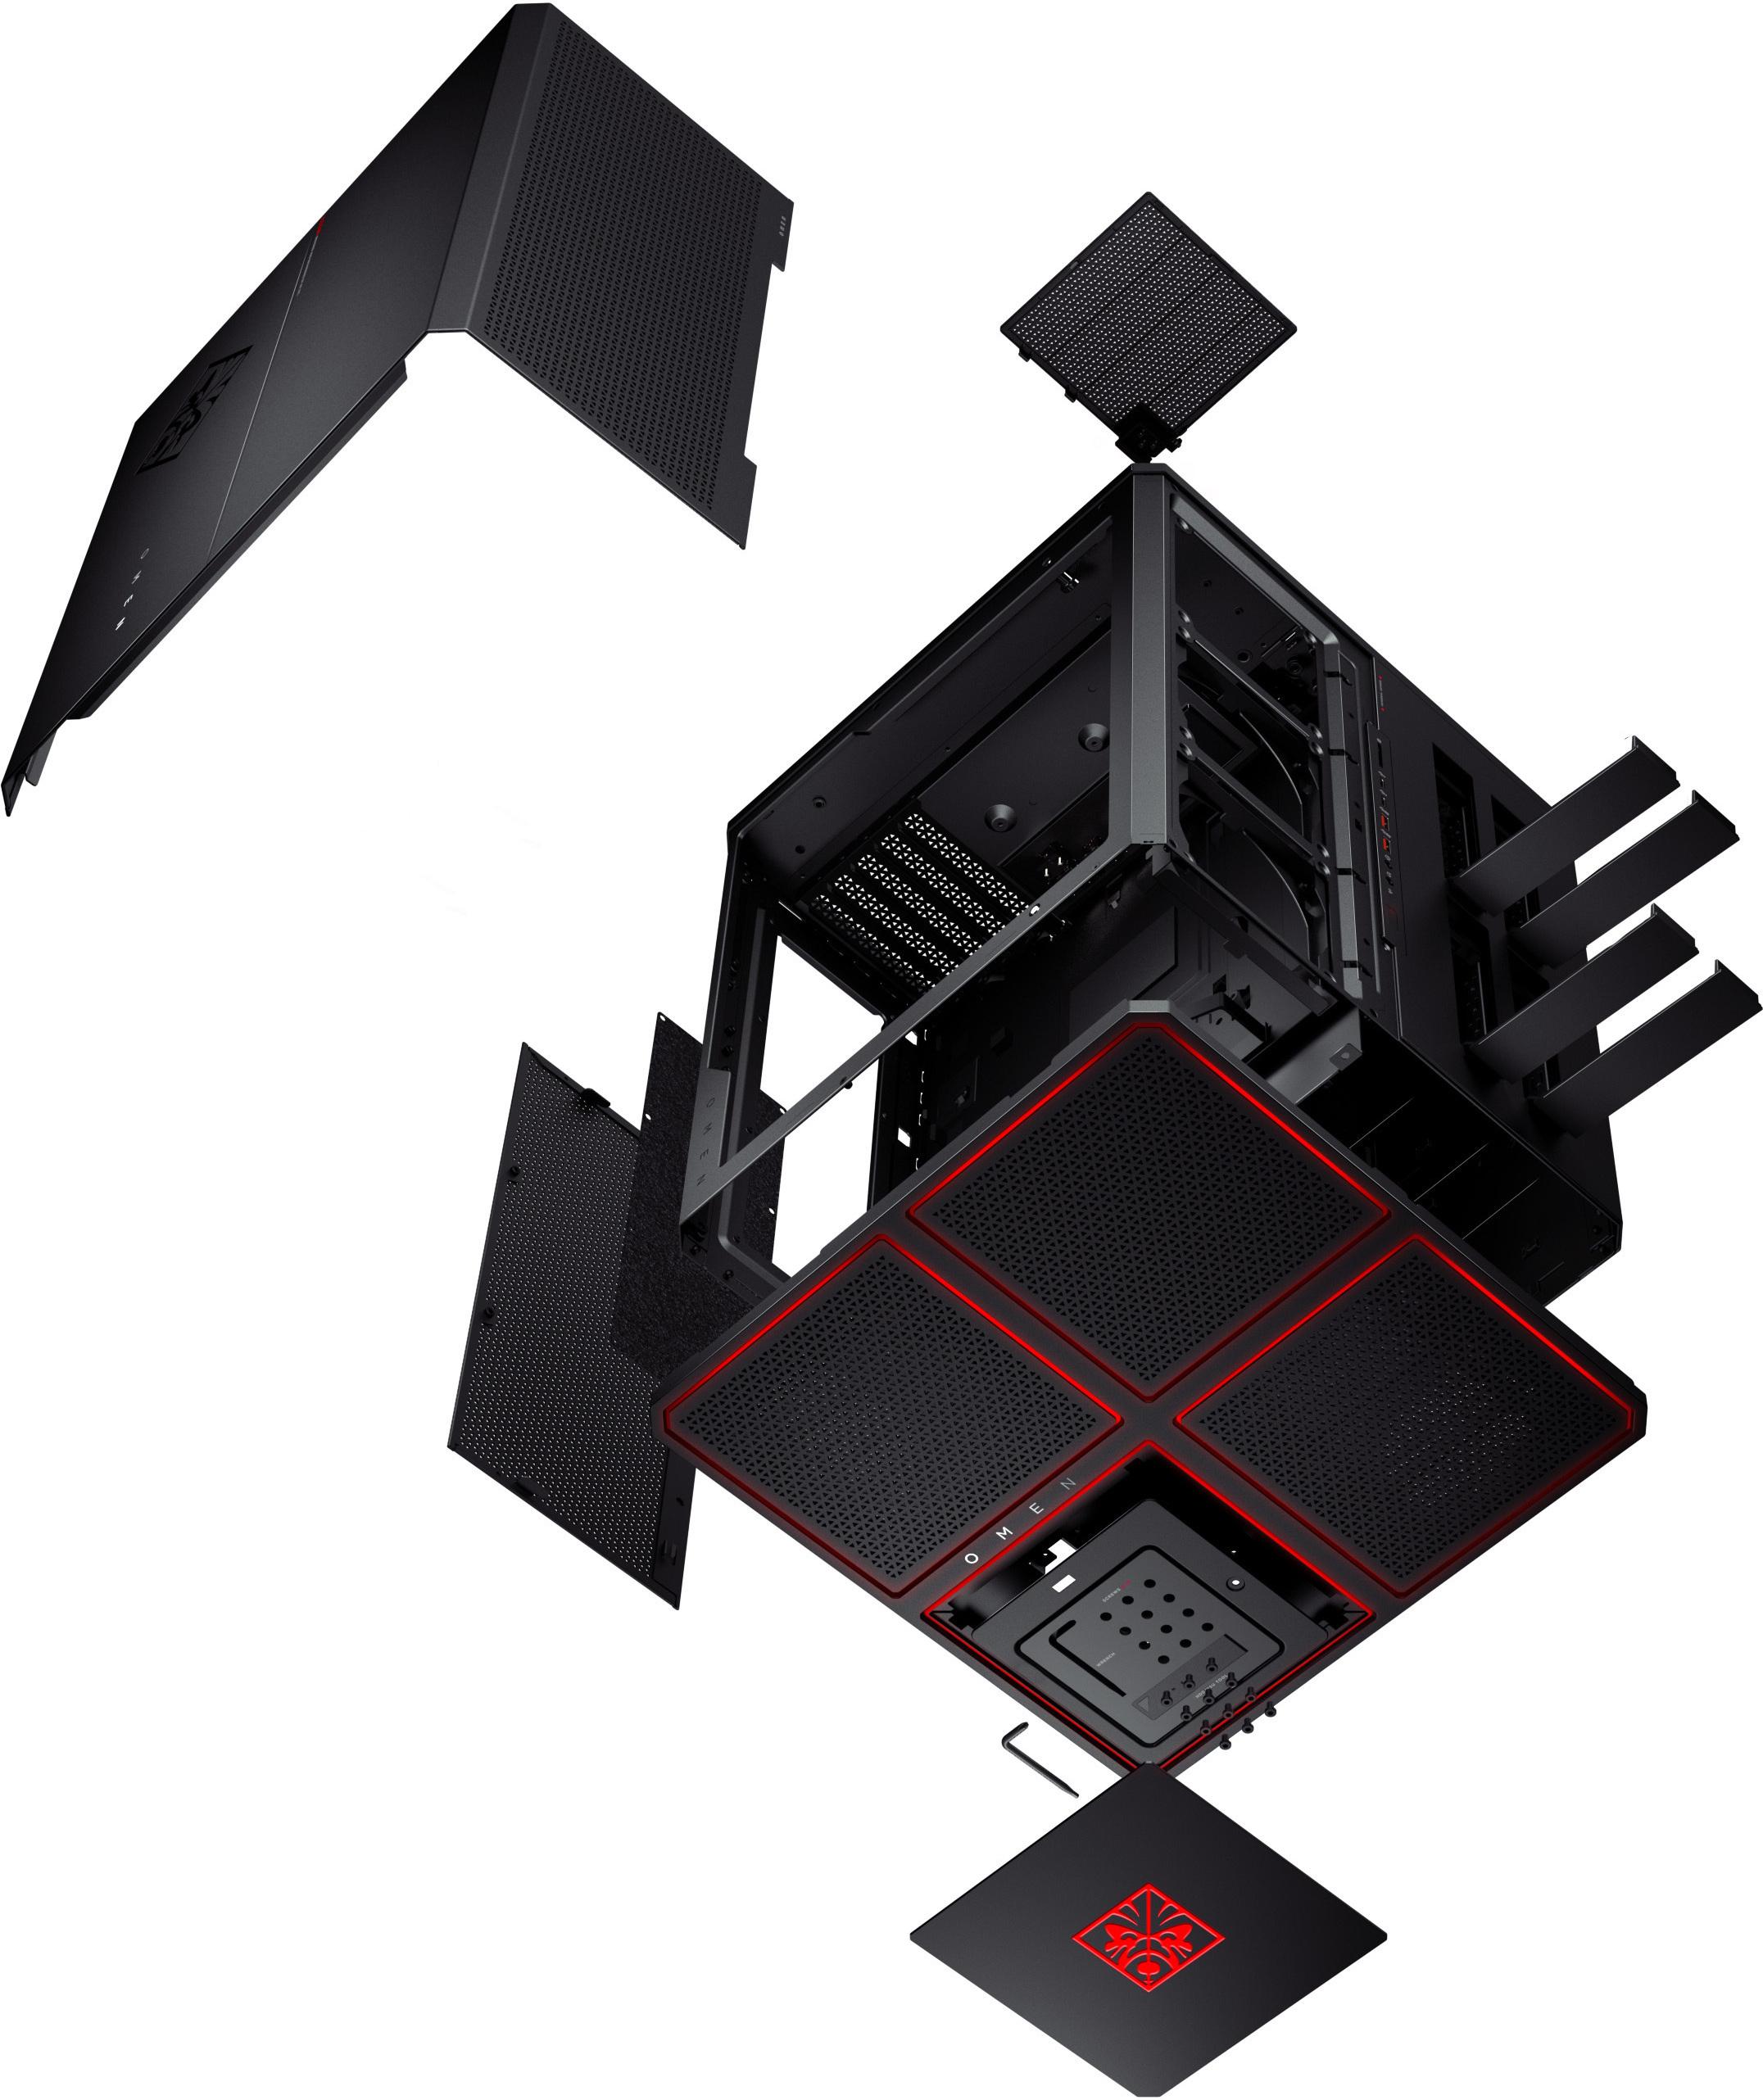 HP OMEN 900-077na 4GHz i7-6700K Scrivania Nero PC